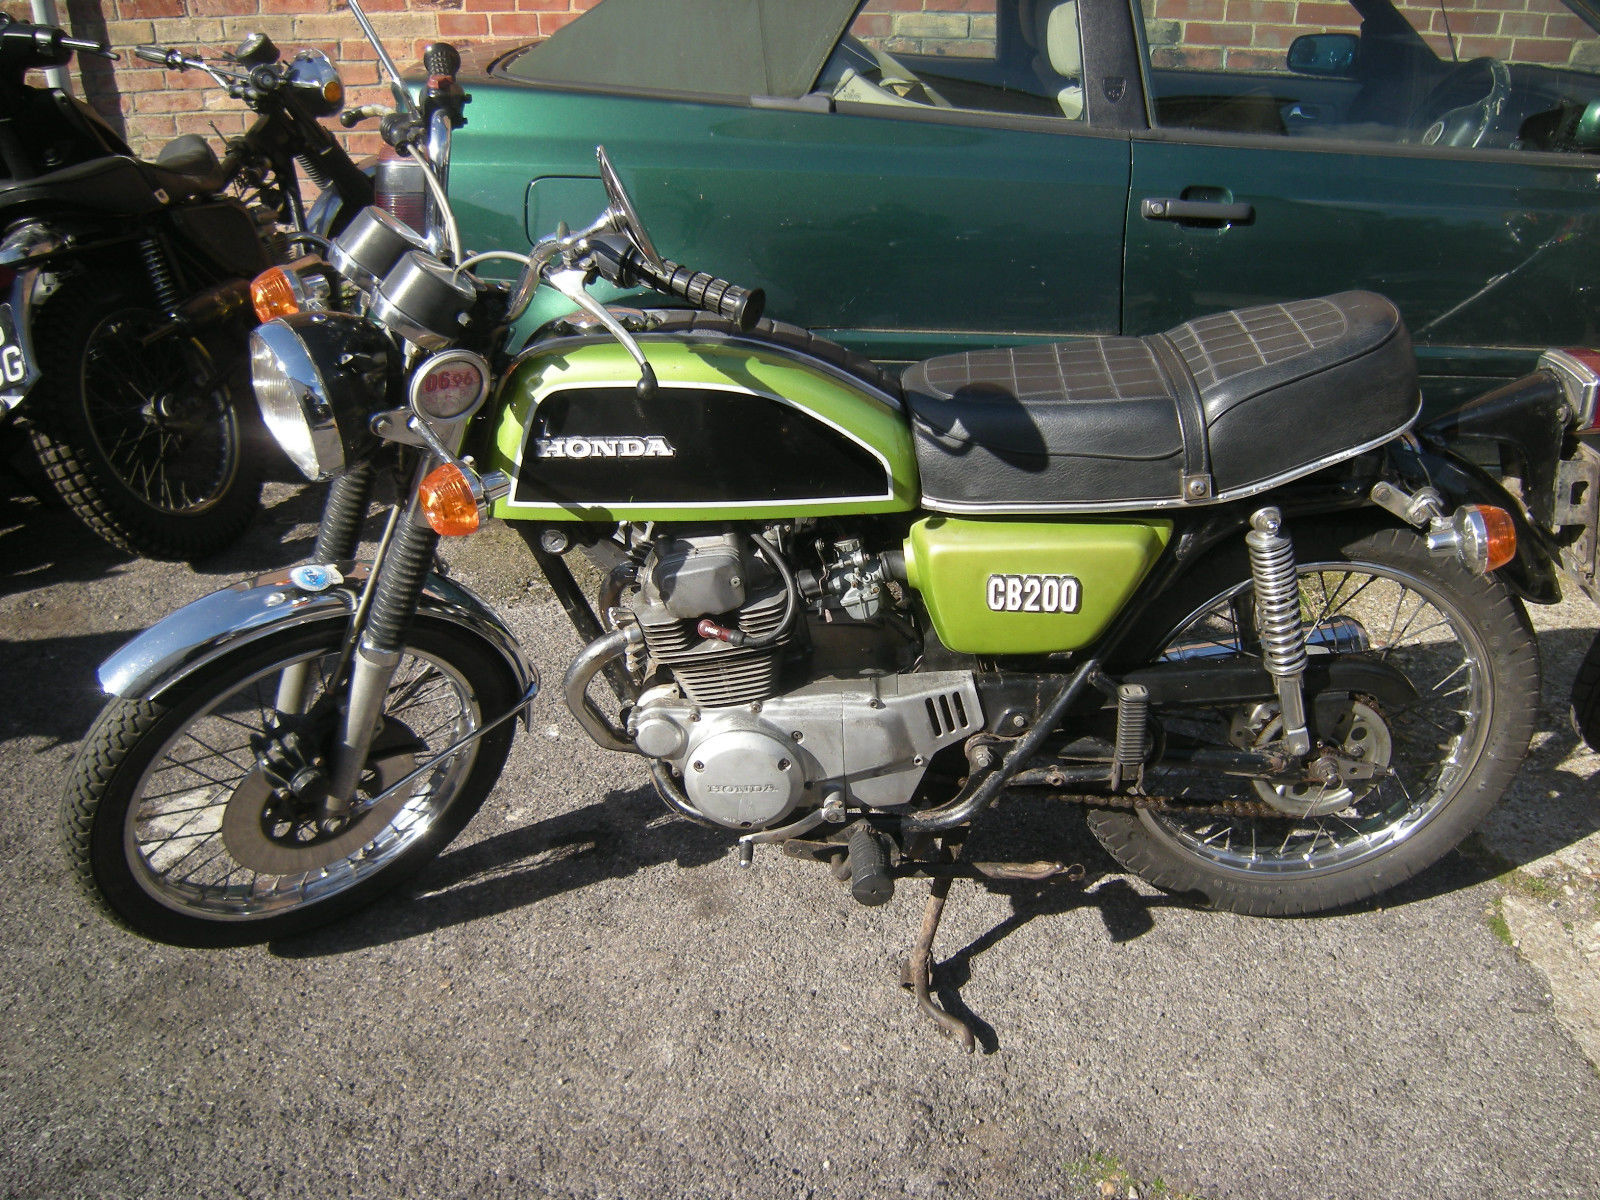 Honda Cb200 1977 1 Years Mot Original Condition Cafe Racer